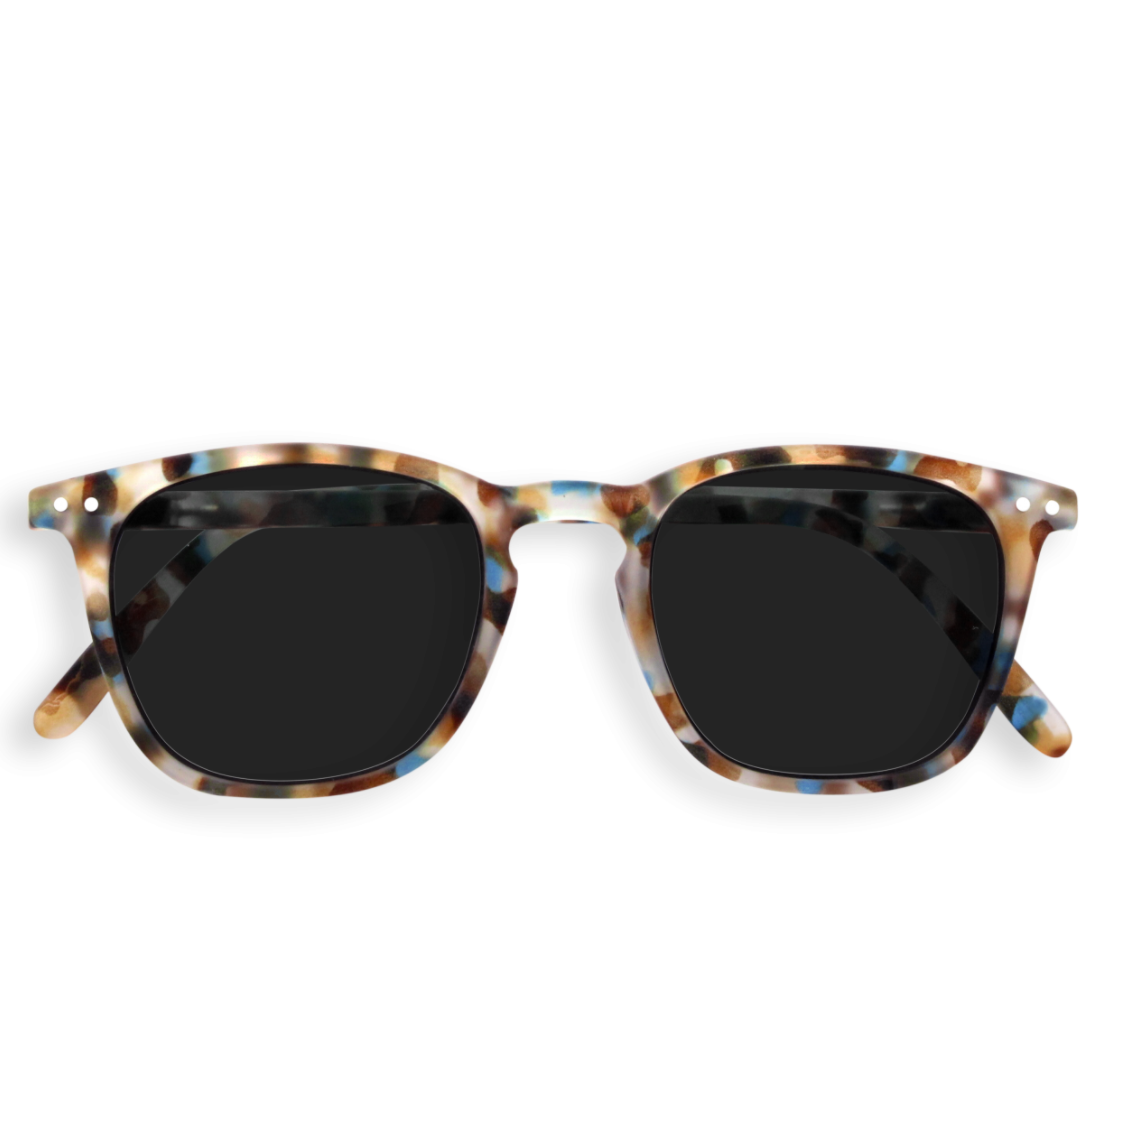 Sunglasses #E - Blue Tortoise